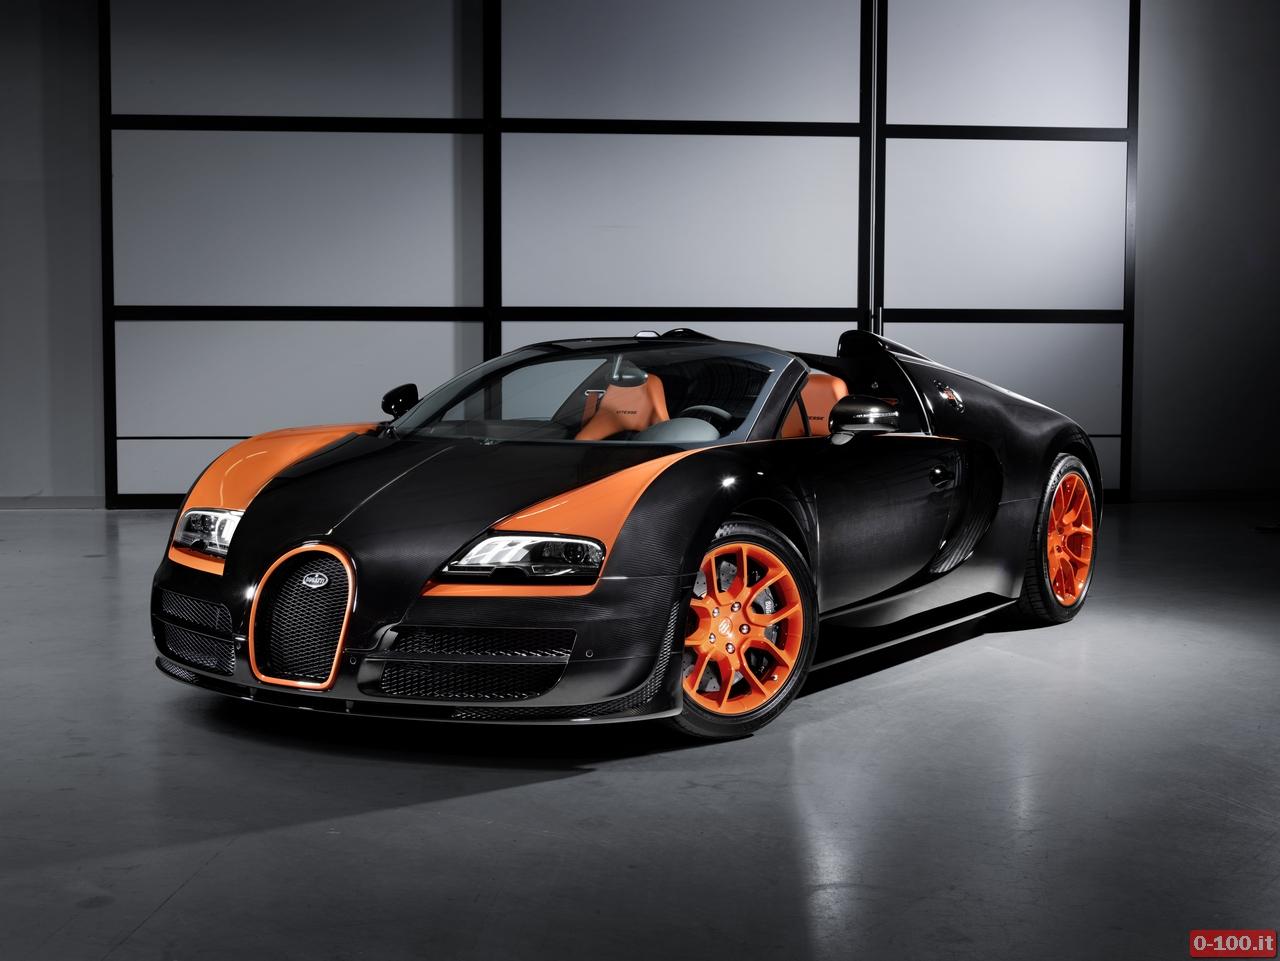 bugatti-veyron-16-4-grand-sport-vitesse-debutto-a-shanghai_0-100_1